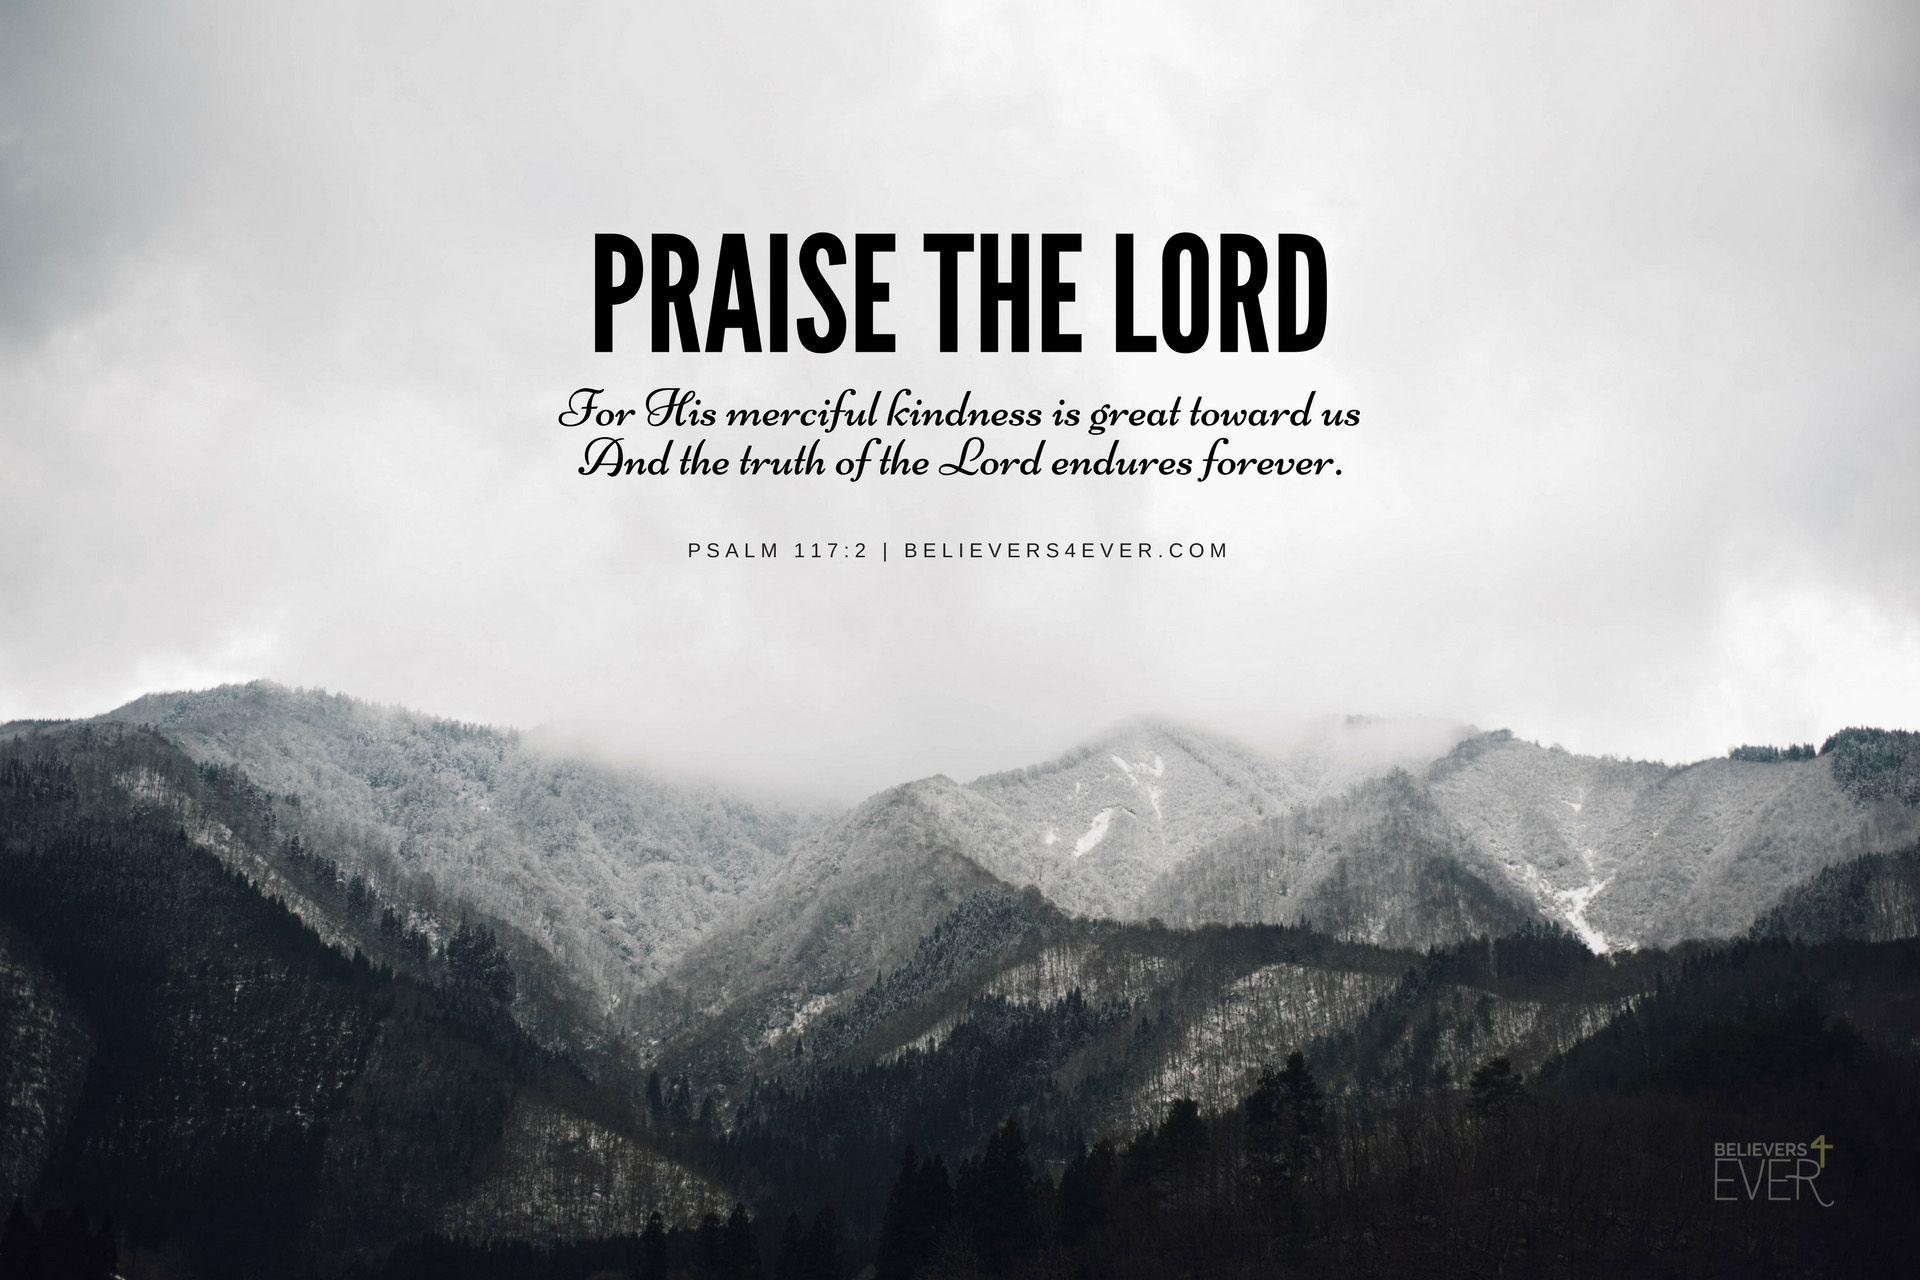 Praise The Bible Verse Christian Desktop Wallpaper Hd, Hd